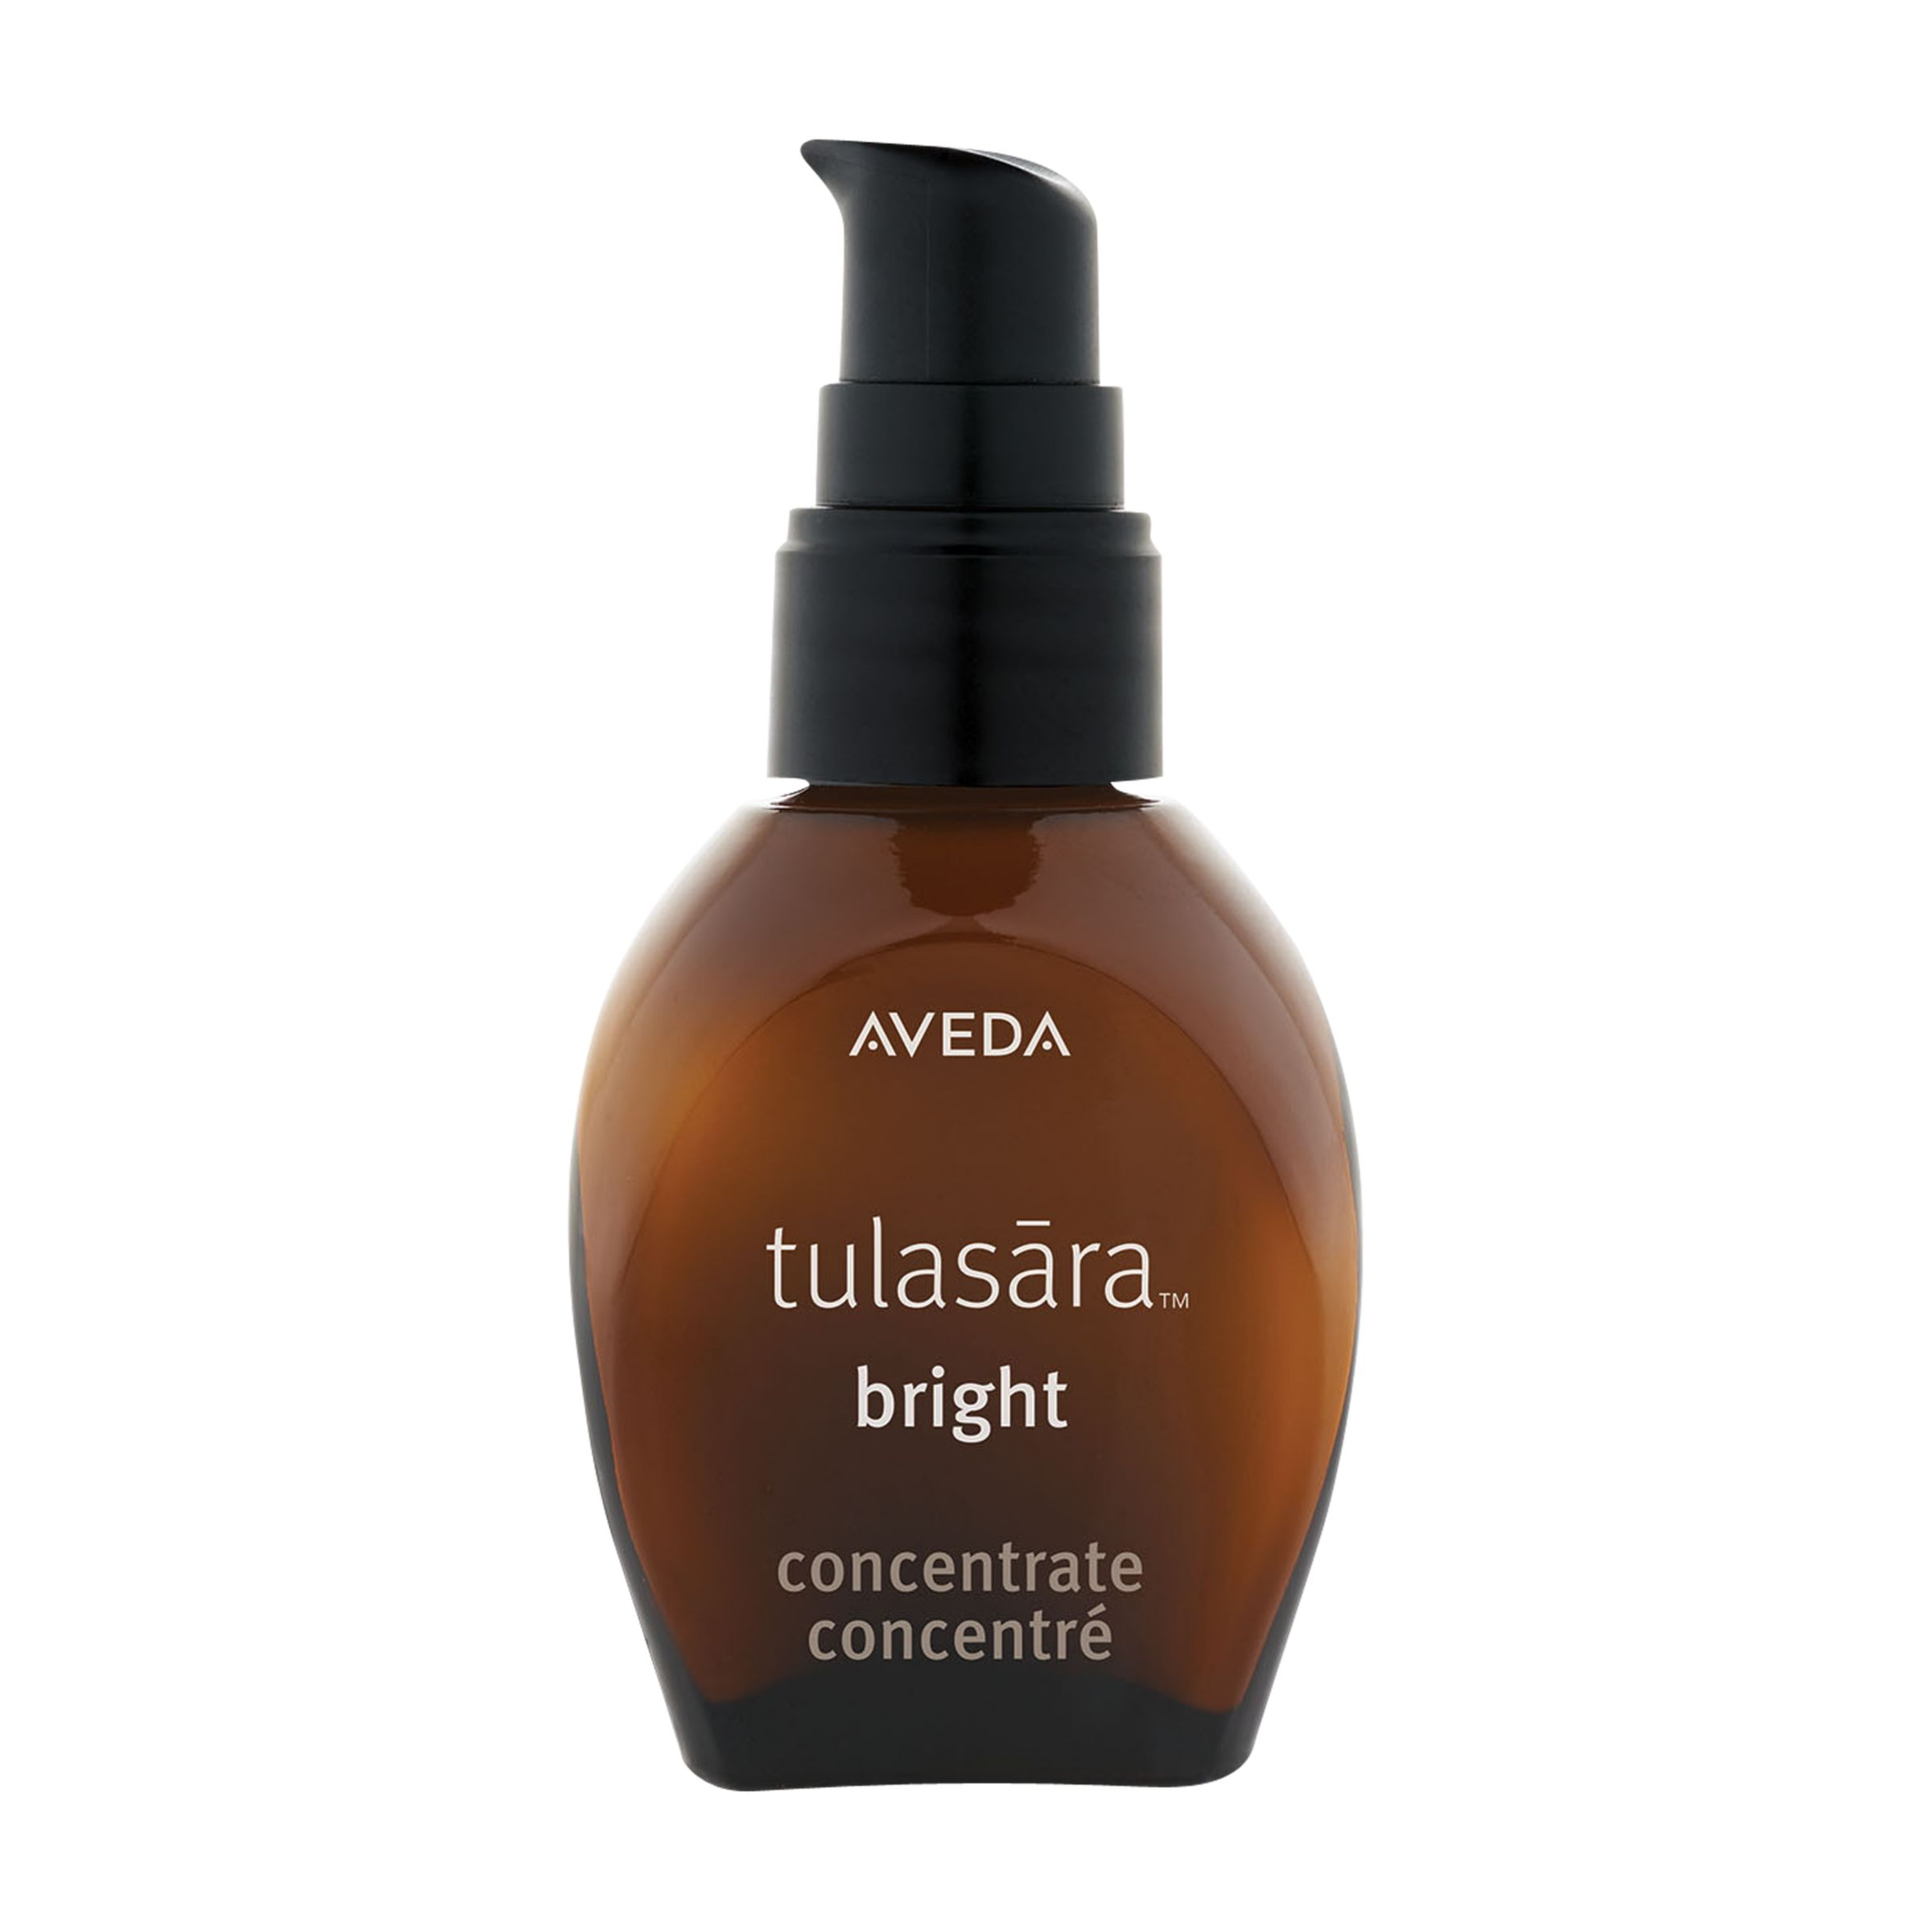 AVEDA AVEDA Tulasara Bright Concentrate, 30ml